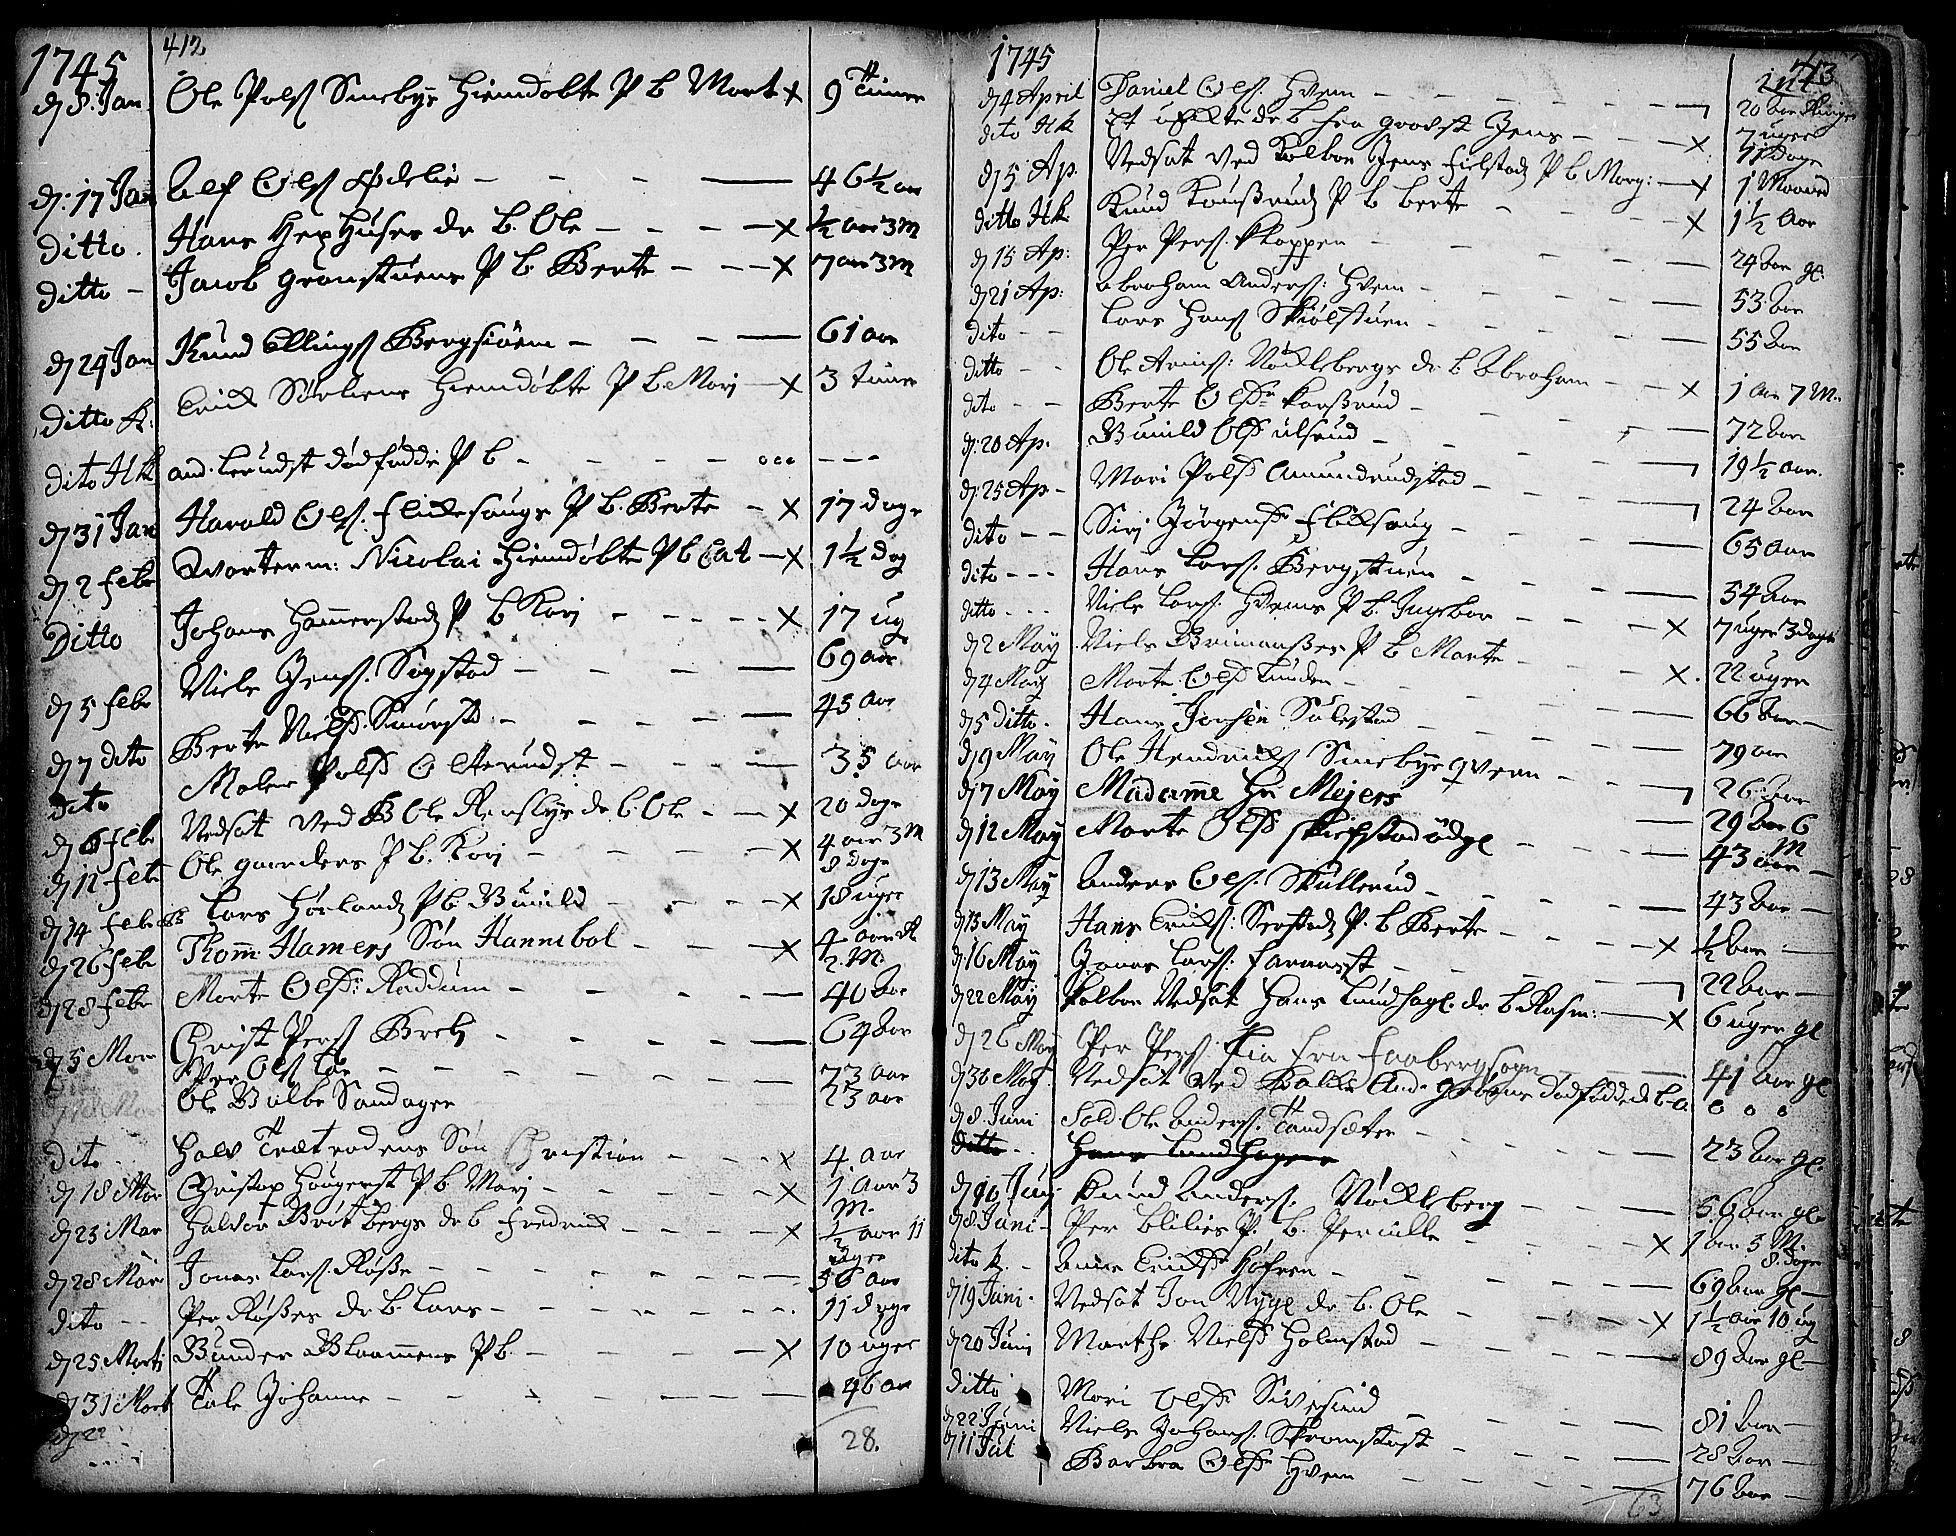 SAH, Toten prestekontor, Ministerialbok nr. 3, 1734-1751, s. 412-413